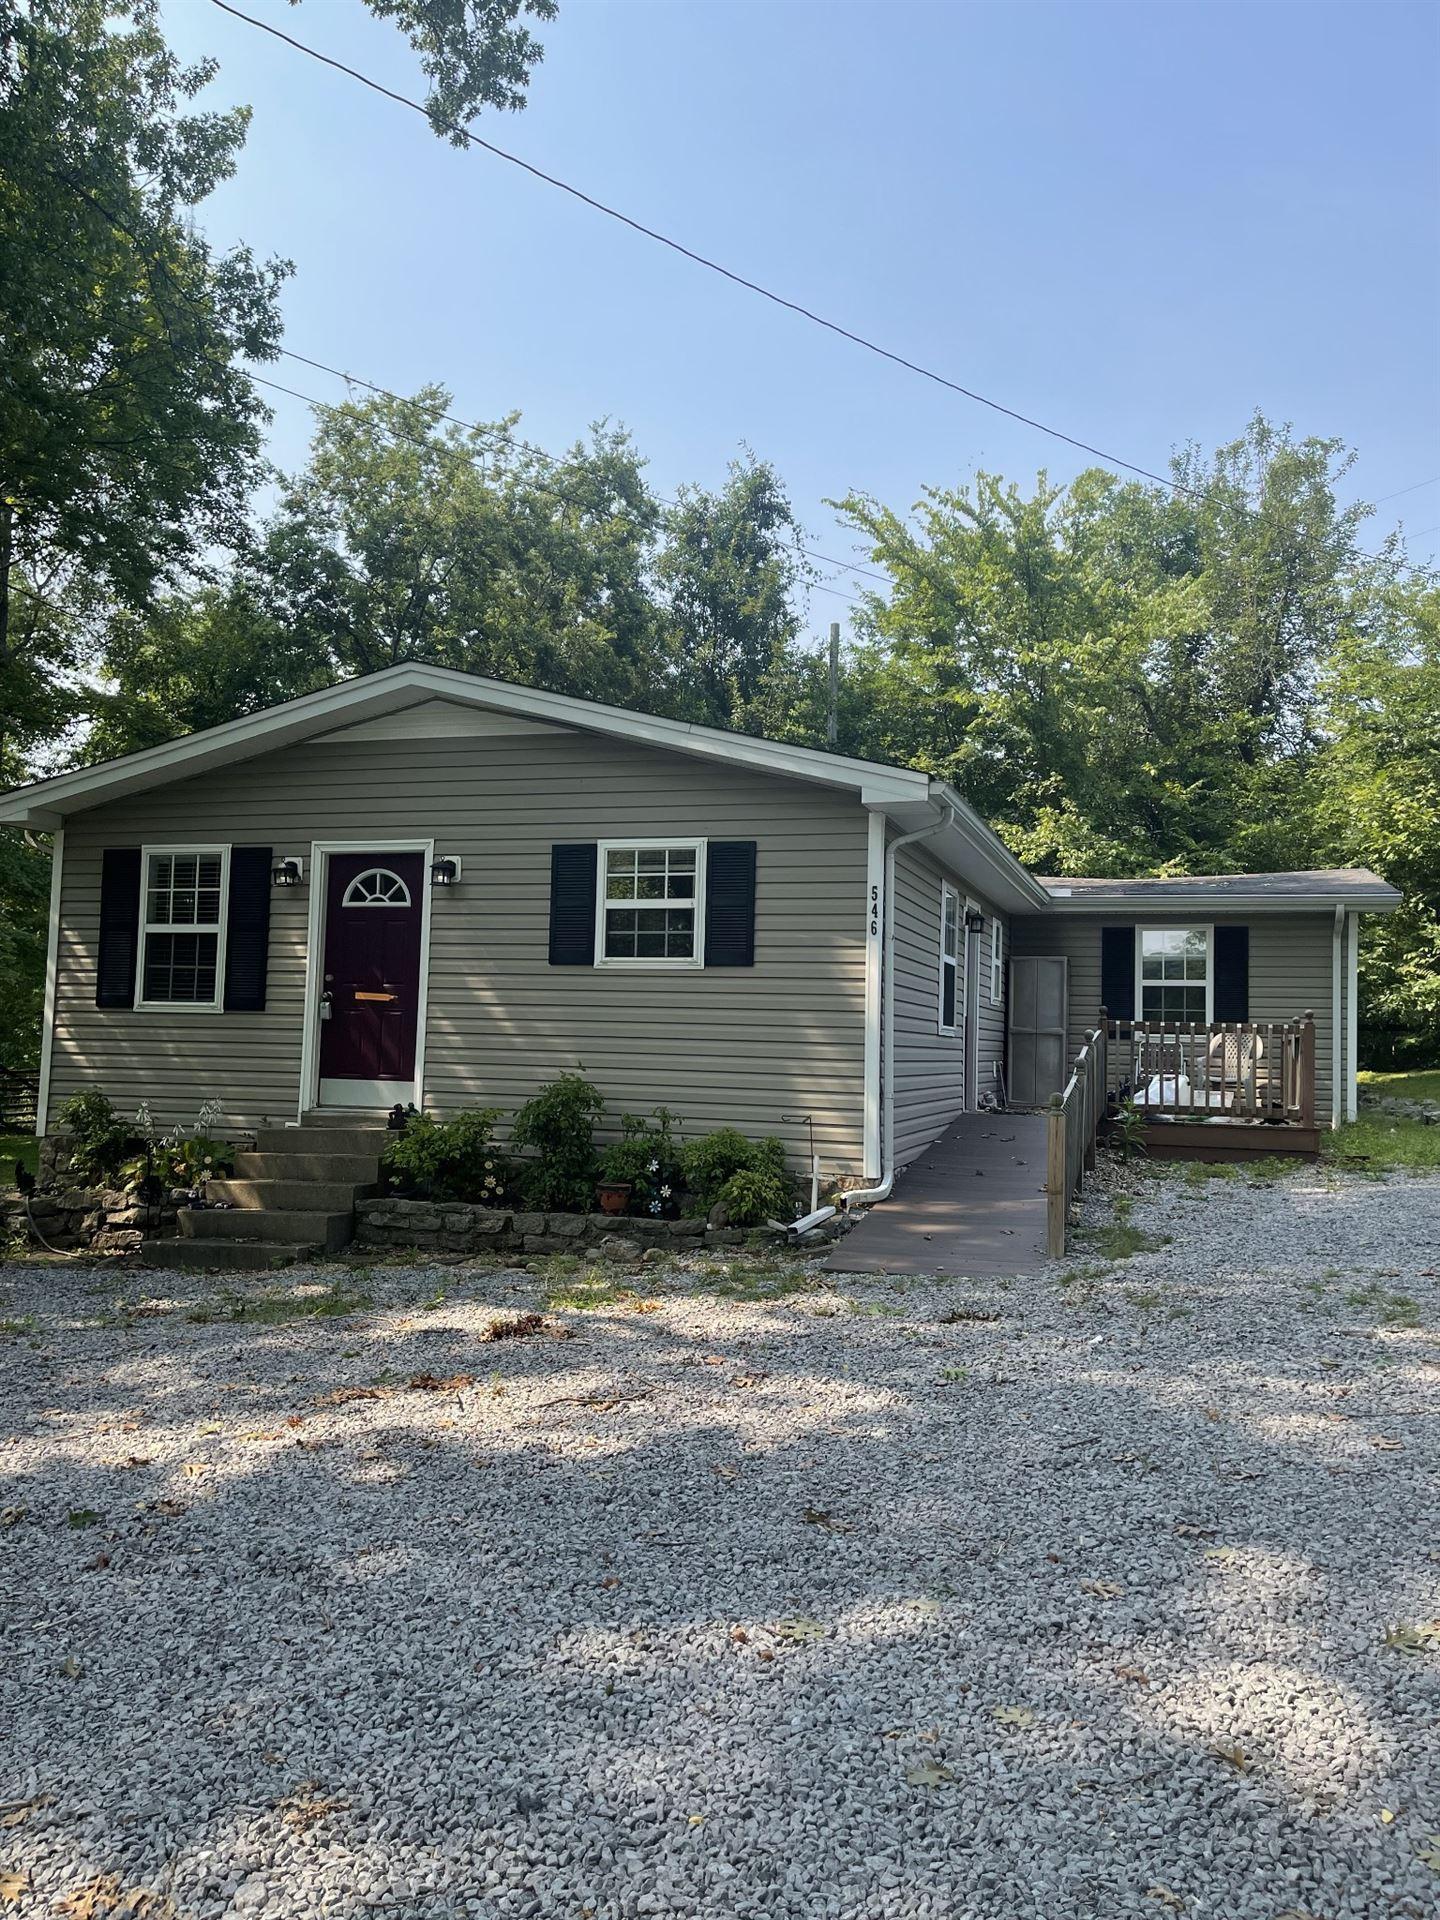 546 Central Valley Rd, Murfreesboro, TN 37129 - MLS#: 2277342